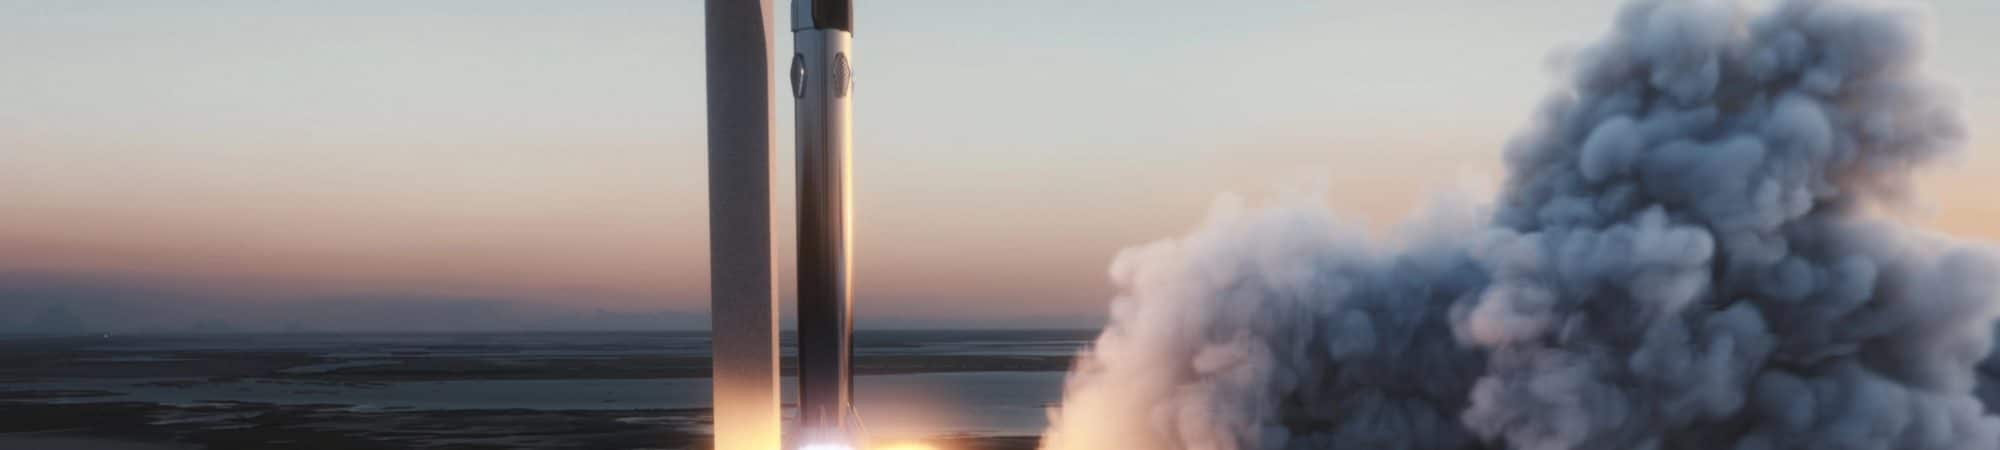 Starship_Launch-2000x450